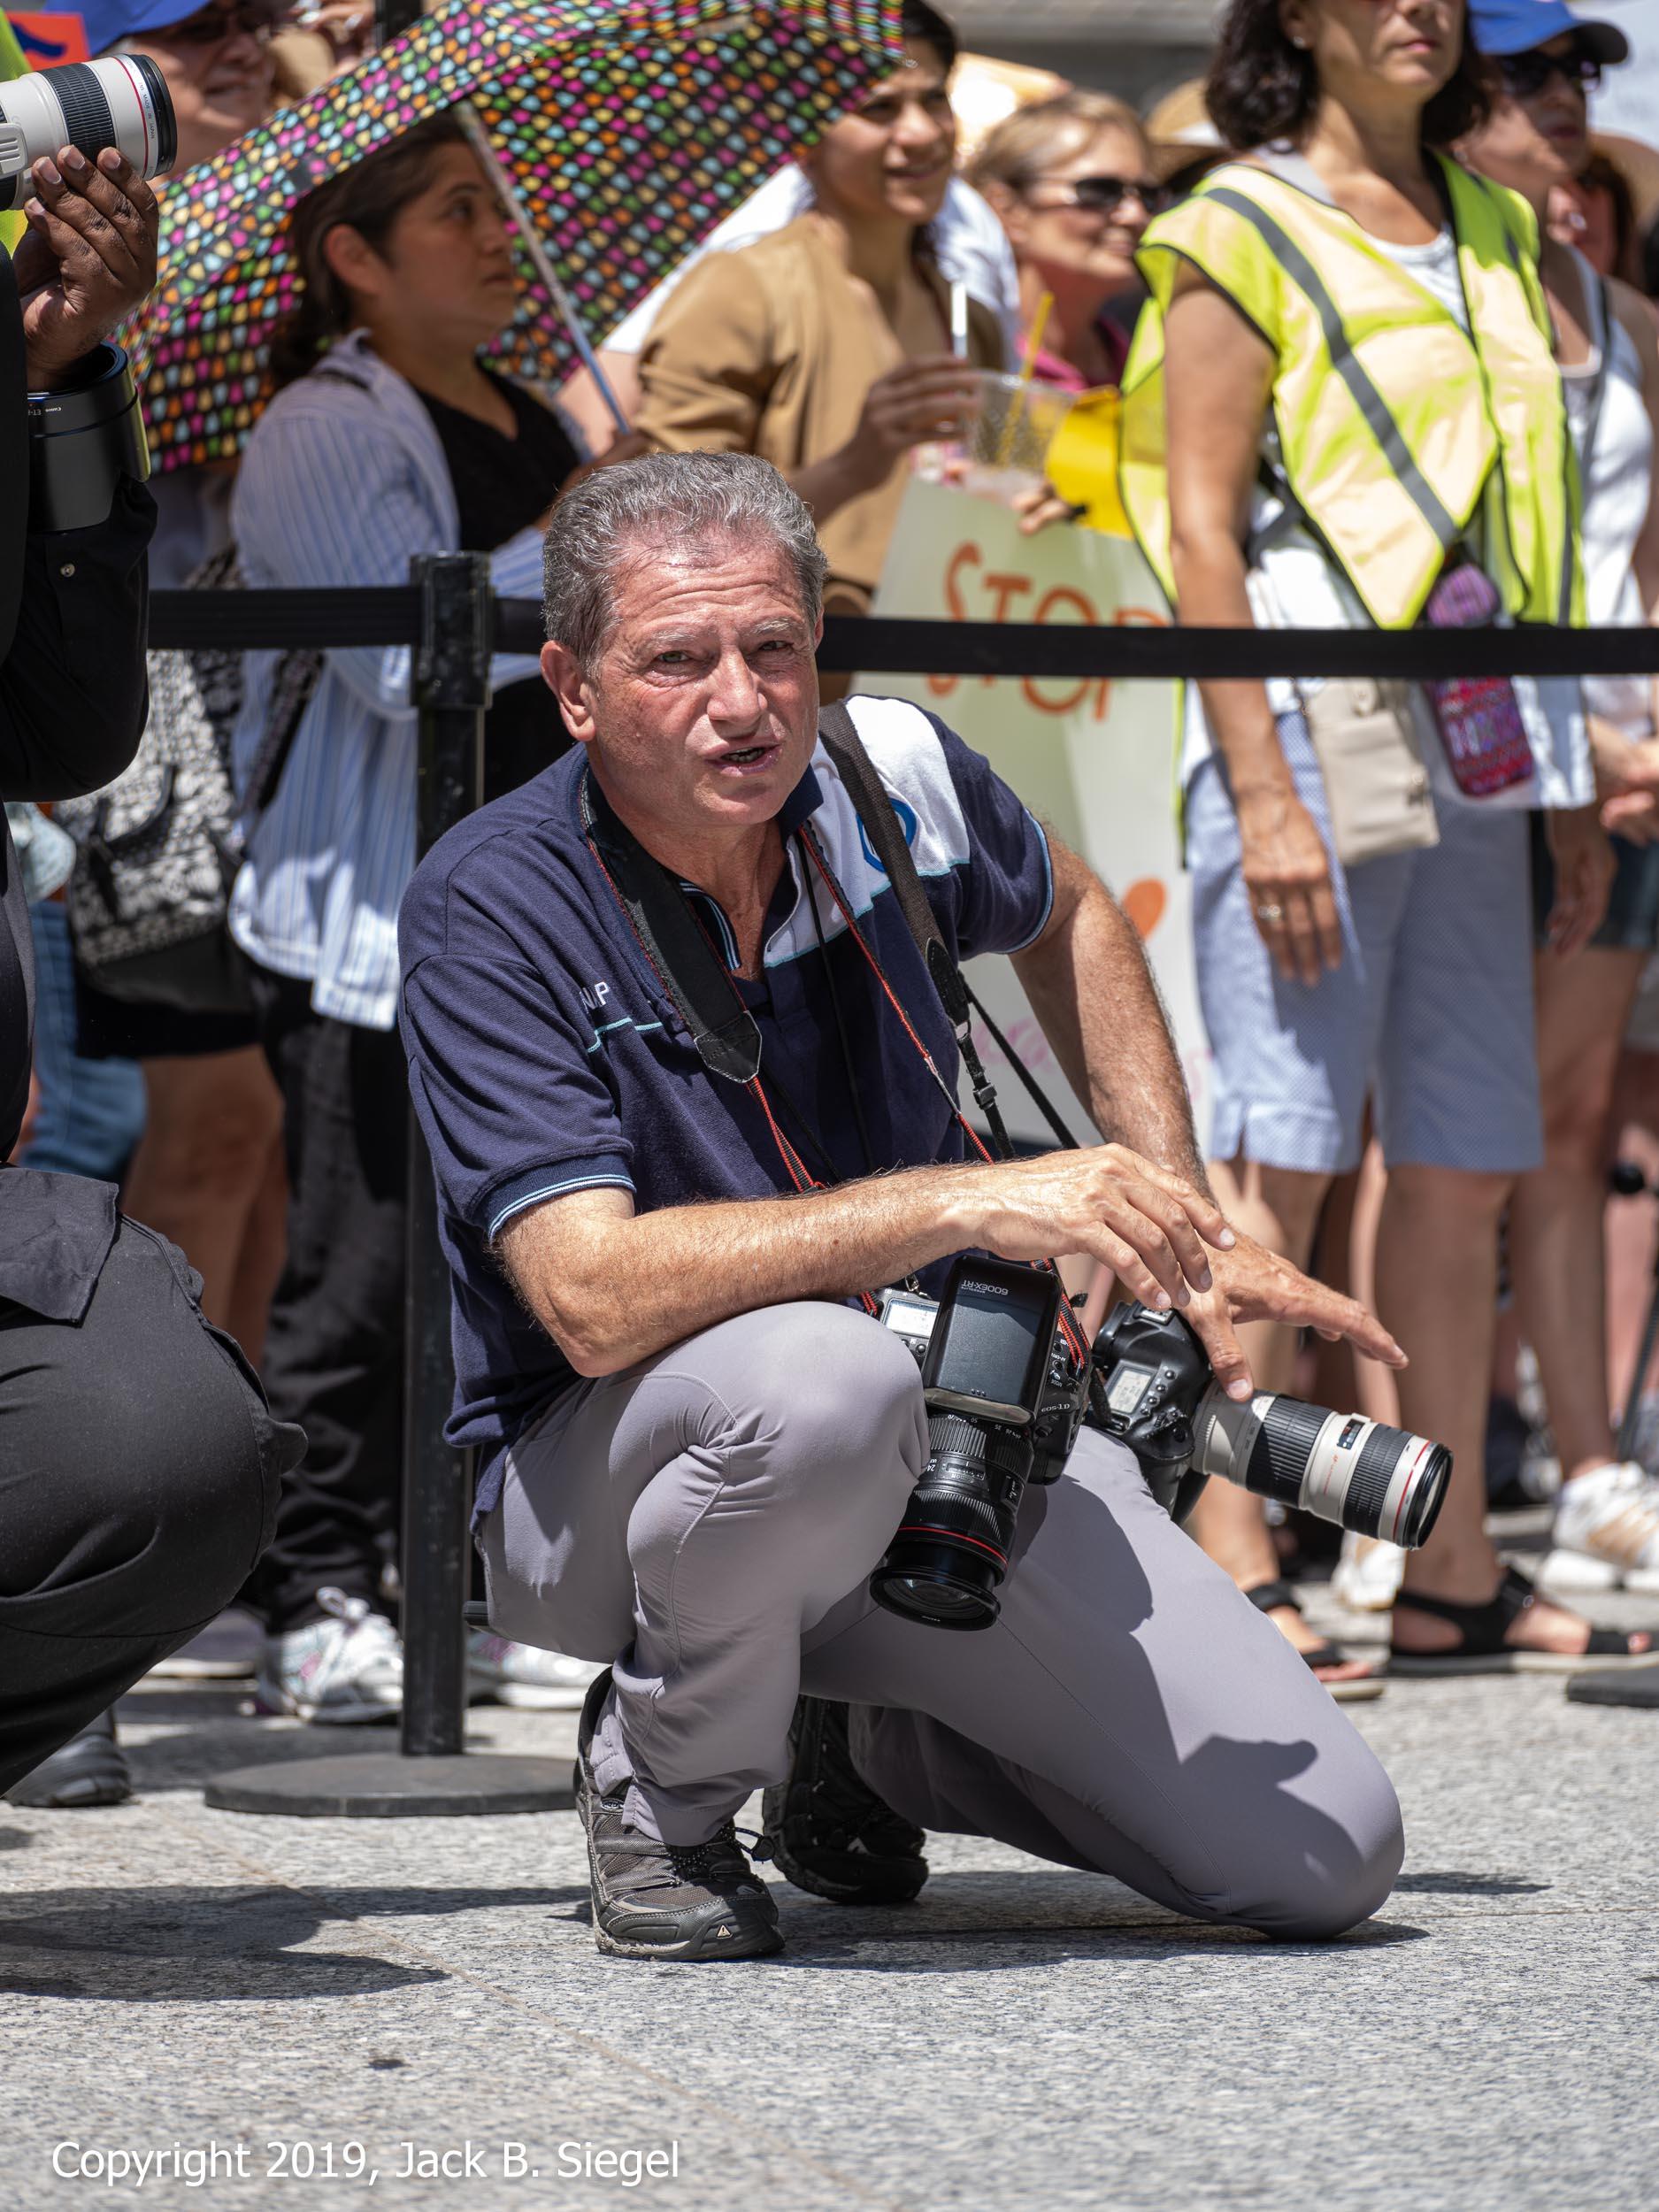 _DSF2610_Copyright 2018 jpeg_Nuccio DiNuzzo, Chicago Tribune Photographer.jpg